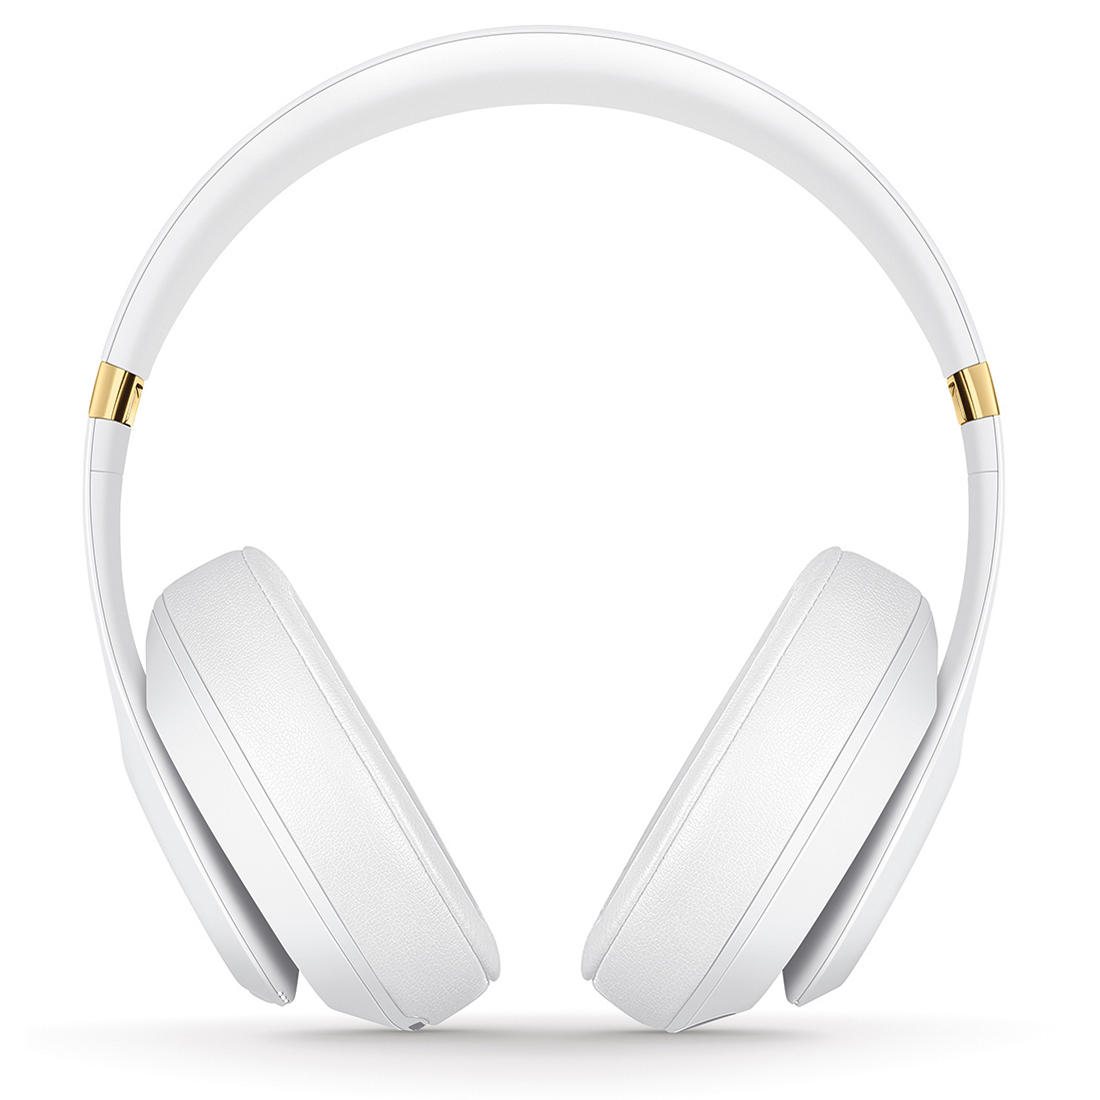 c5e8108712e Beats Studio3 Wireless Headphones - White - BJs WholeSale Club